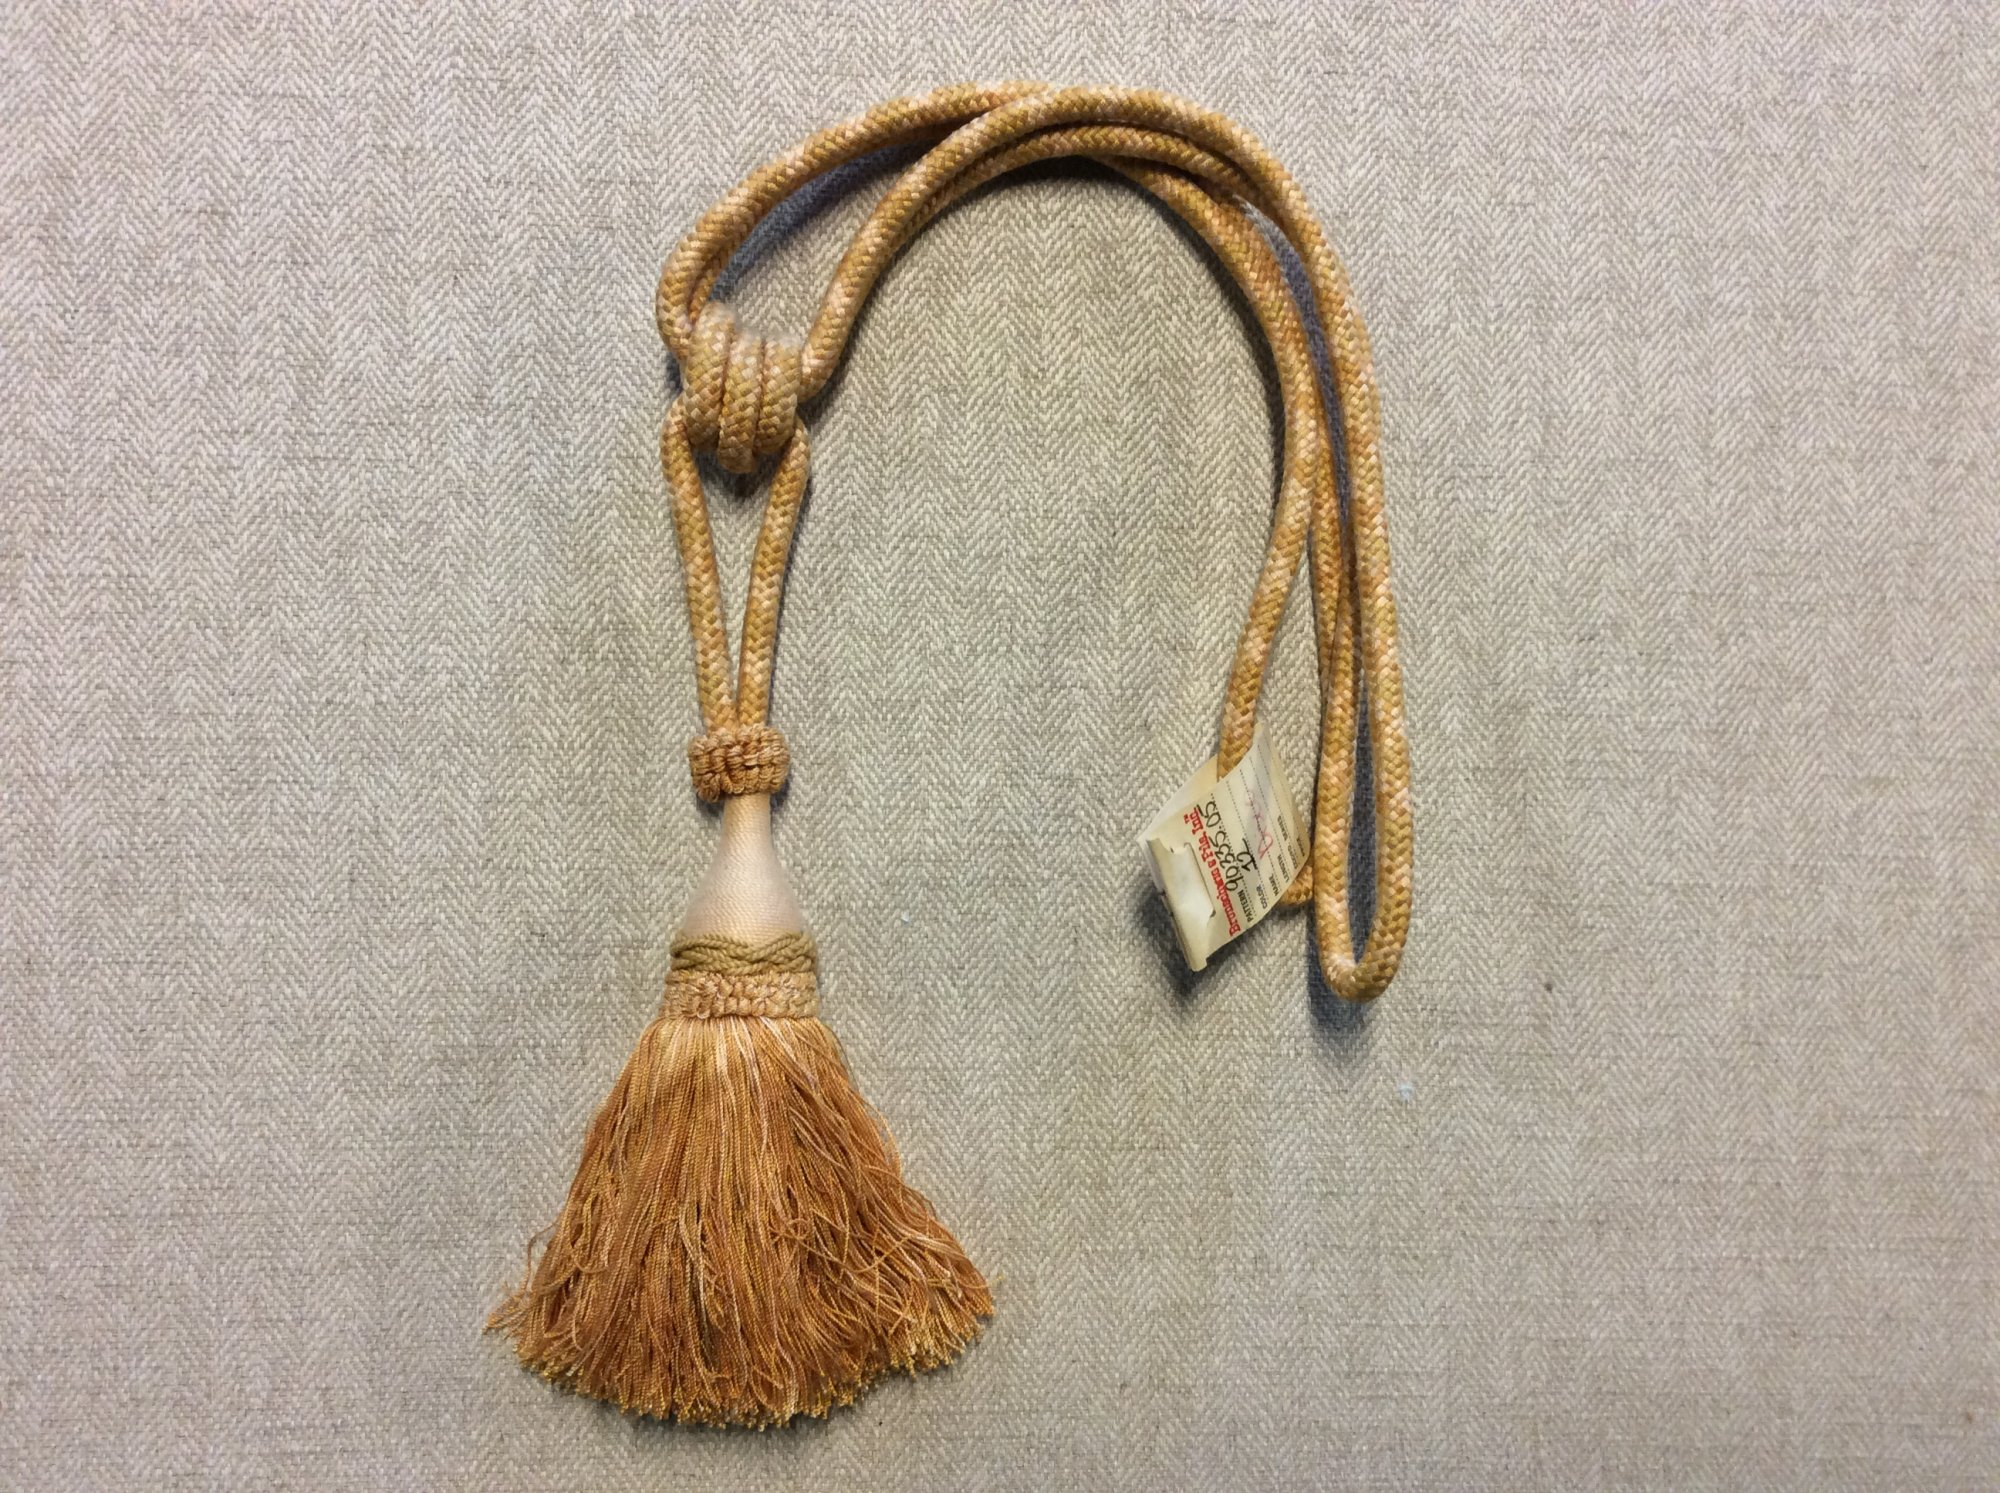 Vintage Brunschwig and Fils Single Tassel Tieback Gold Cotton Drapery Home Decor Tassel 90335.05 Color 12